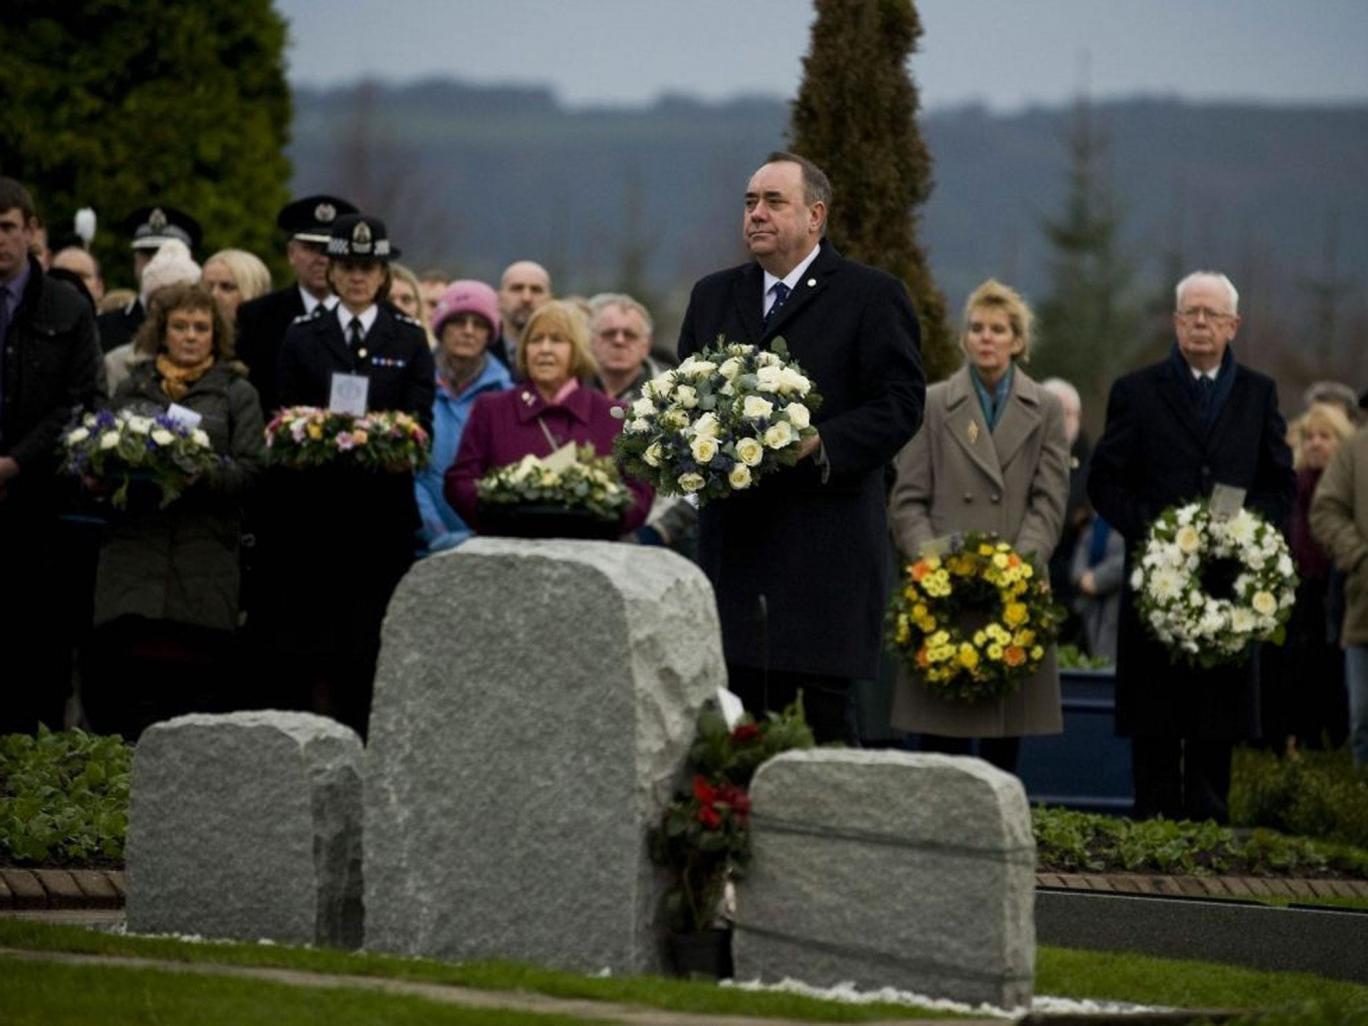 Scotland's First Minister, Alex Salmond, lays a wreath at Dryfesdale Cemetery, near Lockerbie